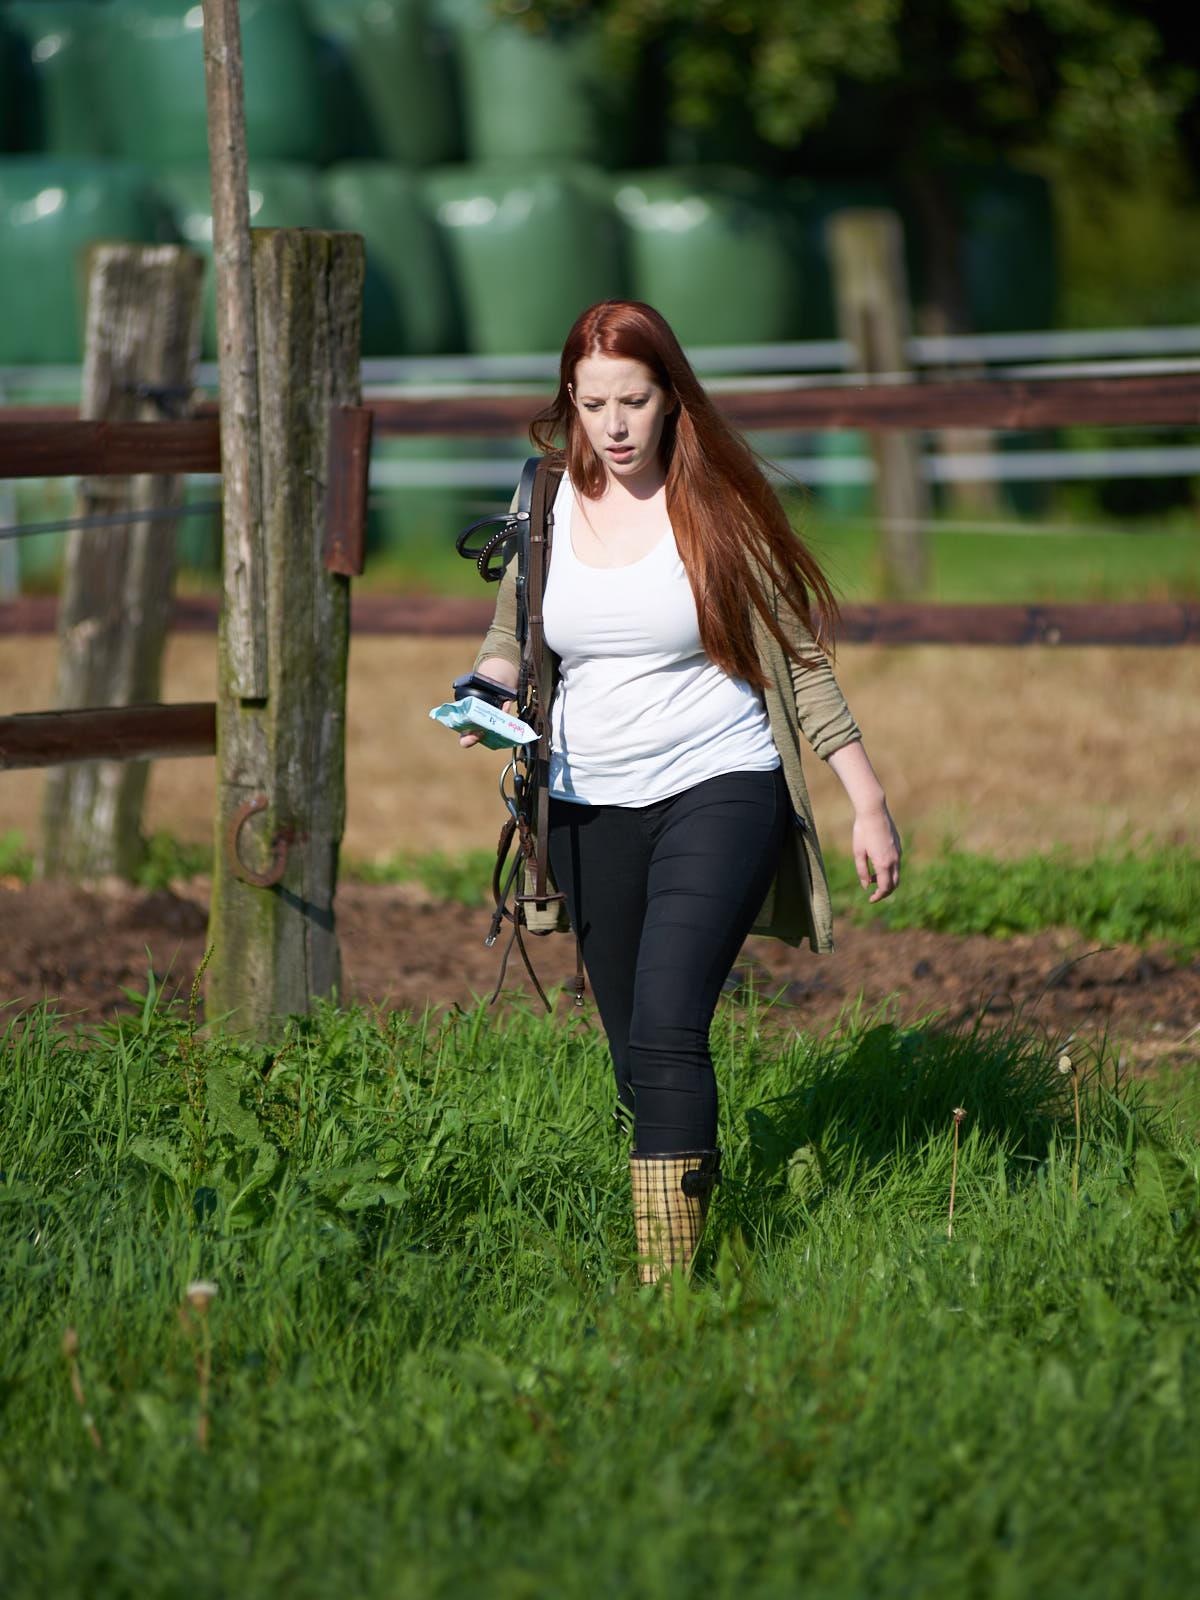 2017-07-13-summergirl-and-horse5300.jpg